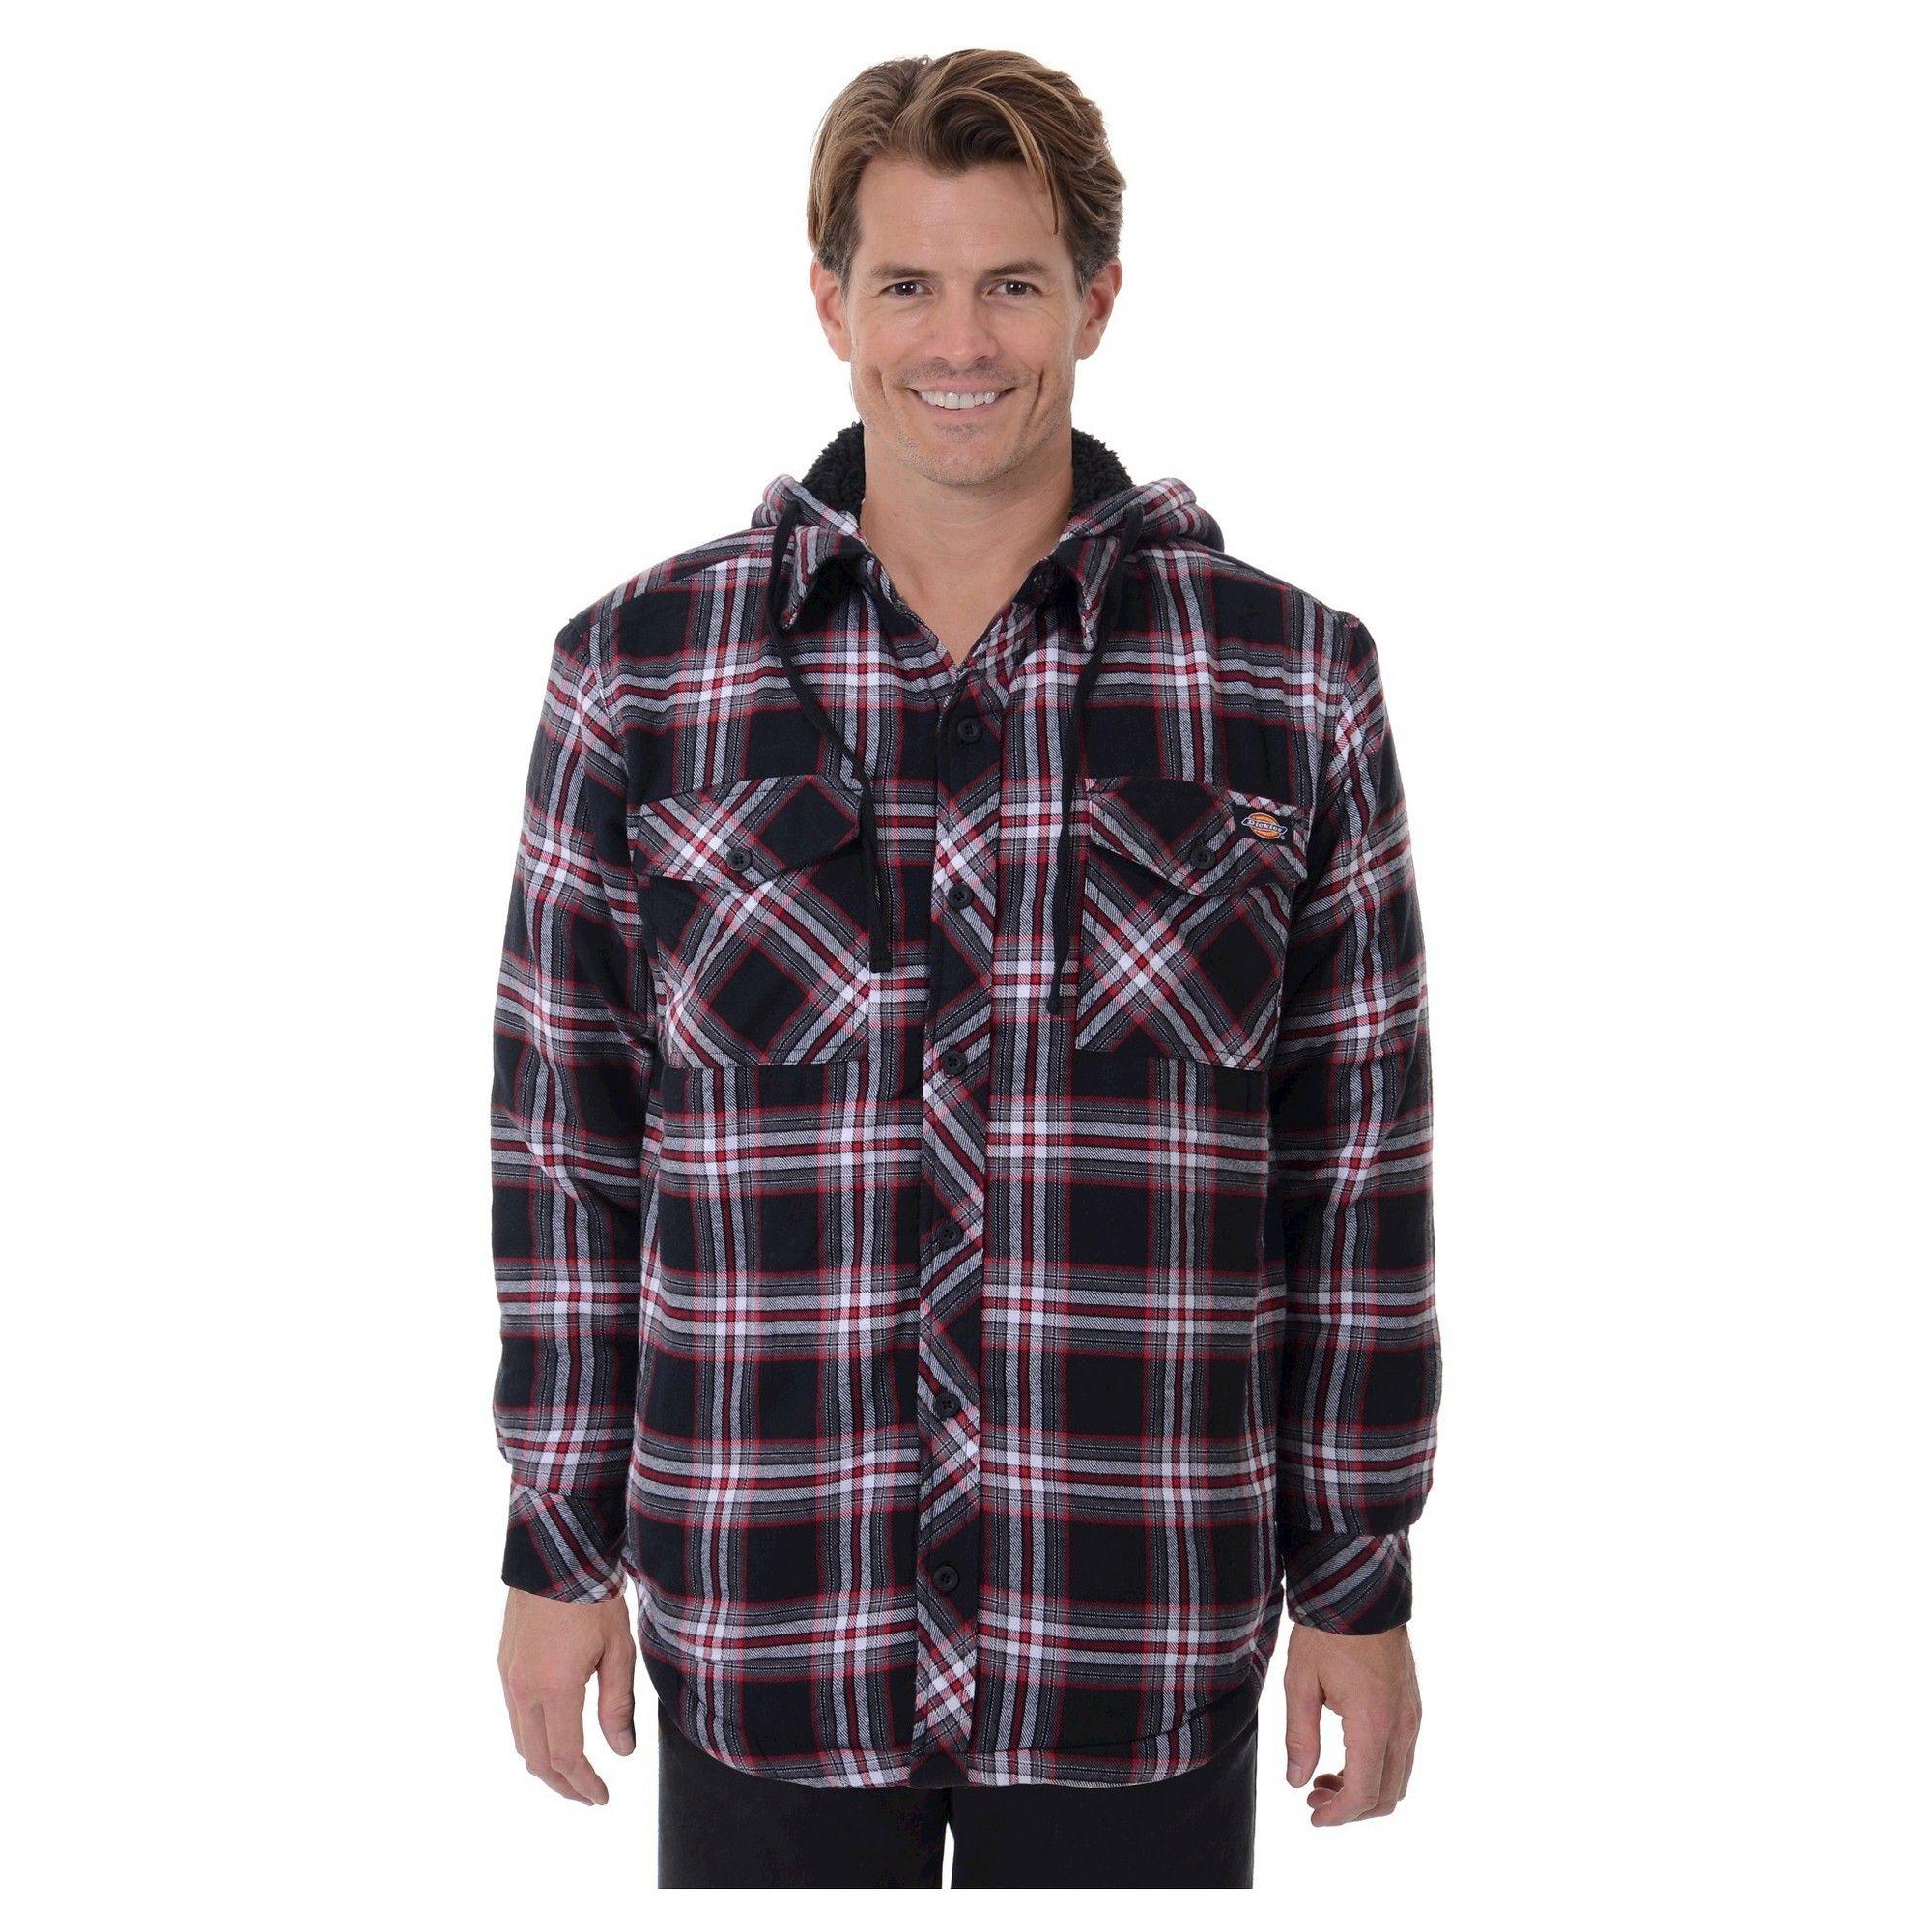 Dickies Men's Sherpa Lined Hooded Flannel Shirt Jacket